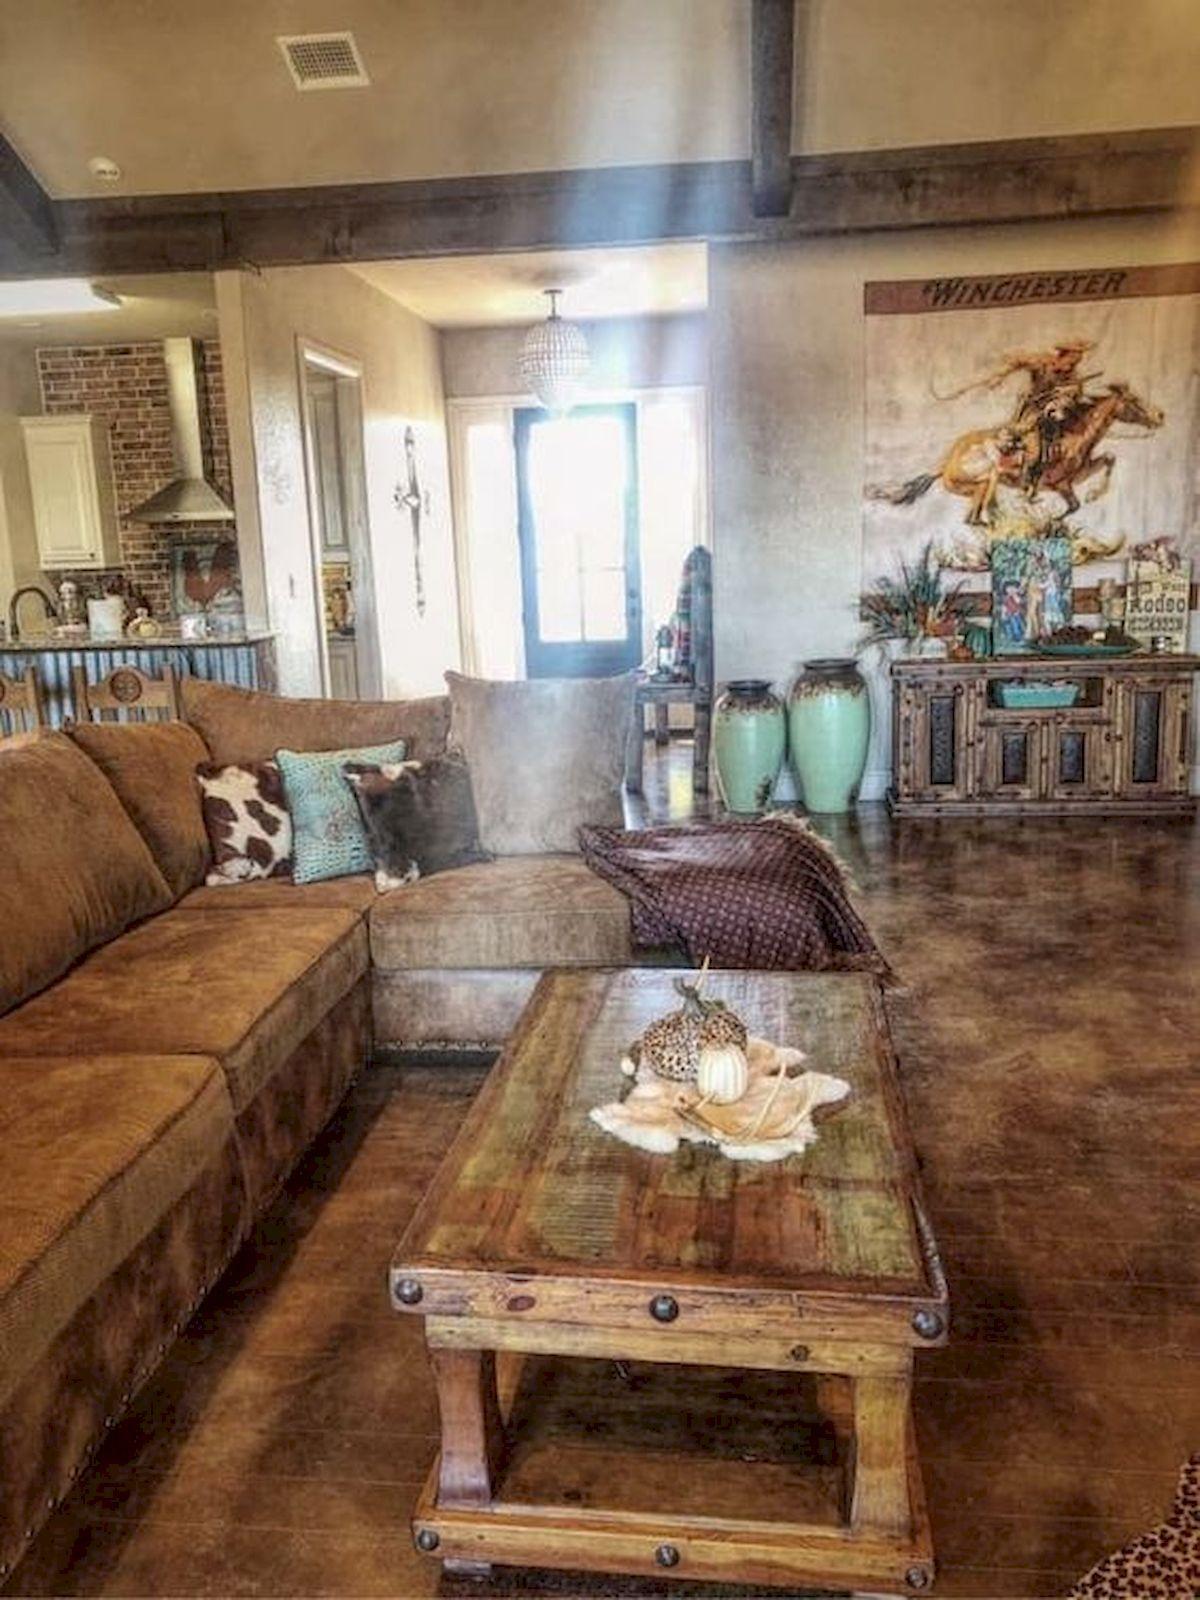 100 Wonderful Rustic Living Room Decor Ideas And Remodel Living Room Decor Rustic Western Living Room Decor Western Home Decor